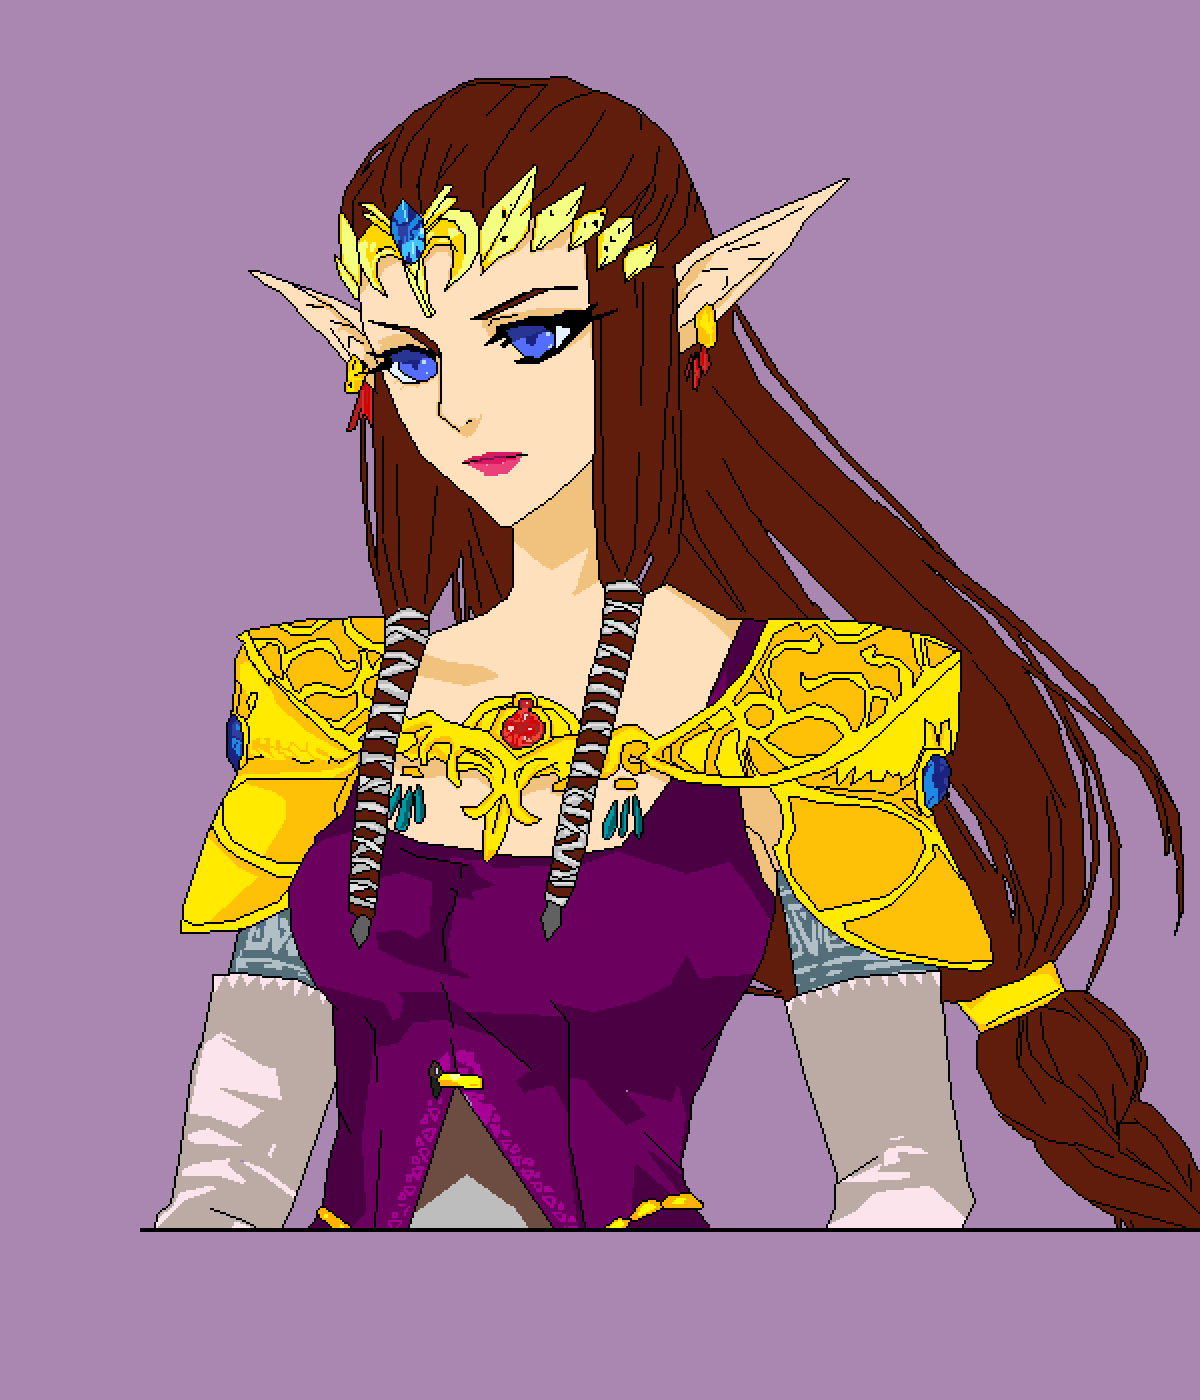 Princess Zelda Twilight princess by pringlez